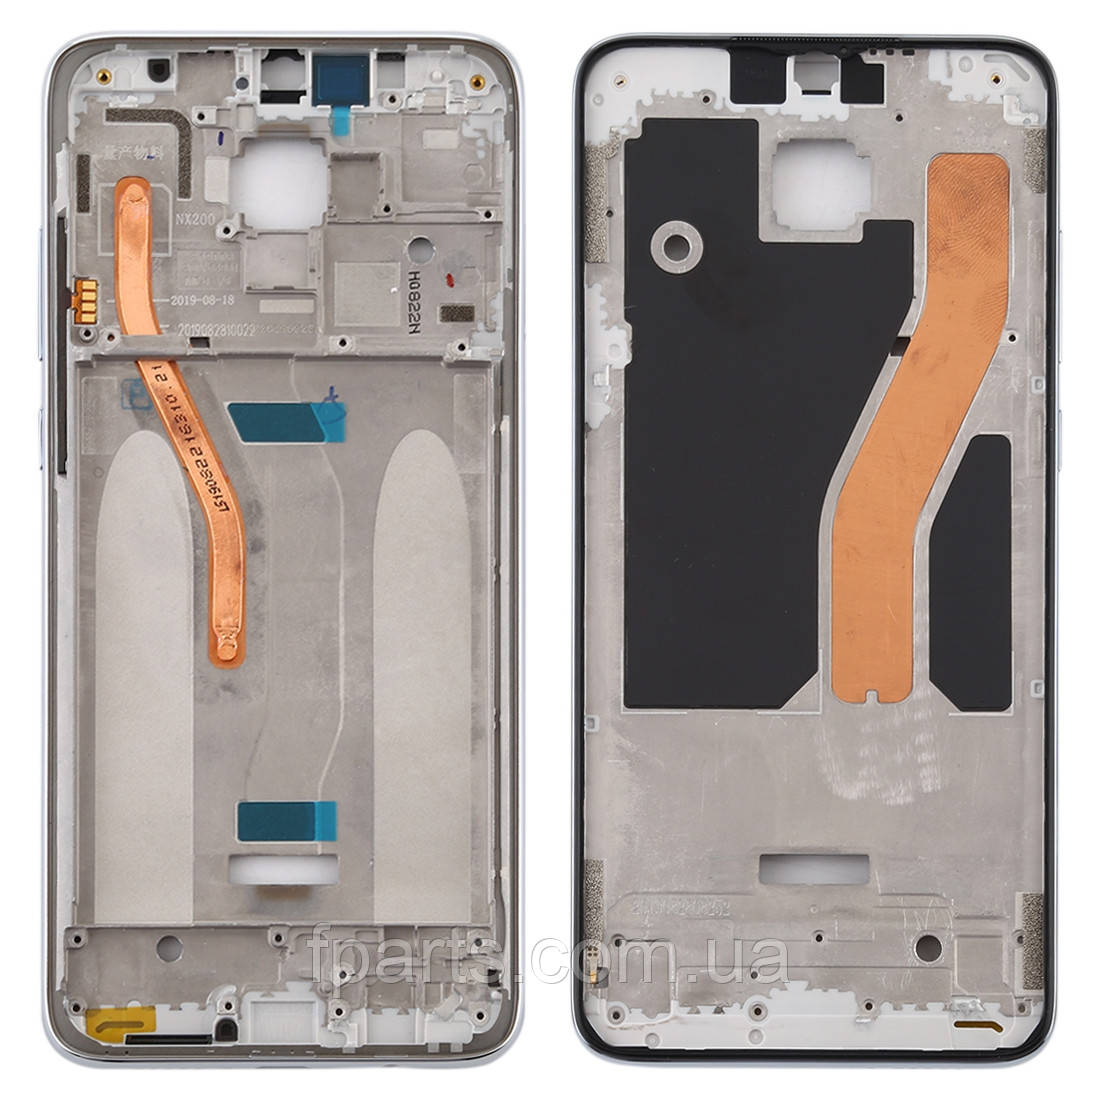 Рамка дисплея Xiaomi Redmi Note 8 Pro, White